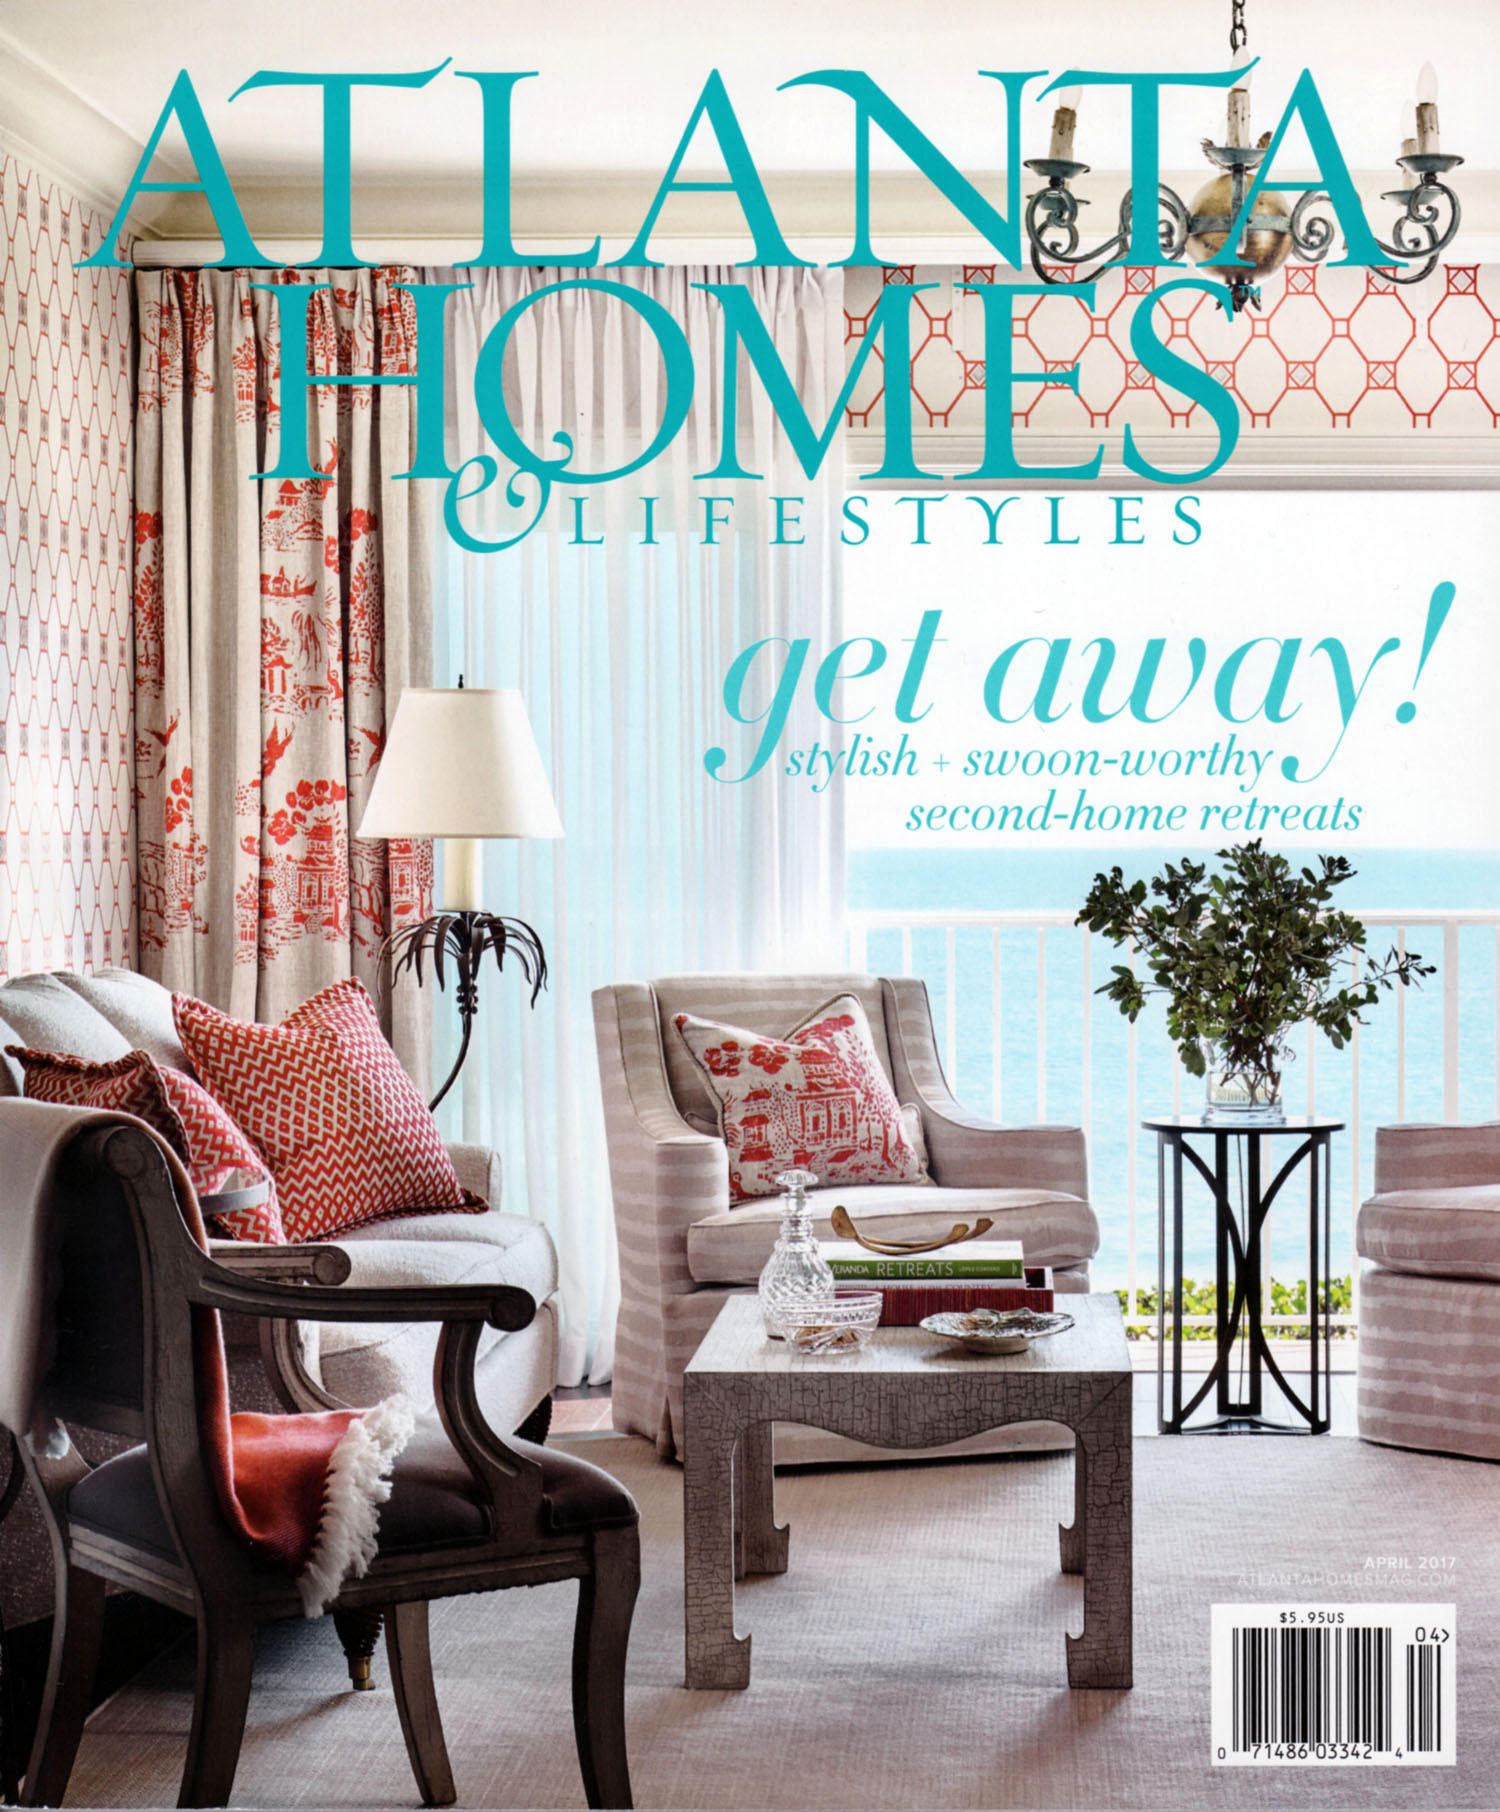 Atlanta Homes & Lifestyles April 2017